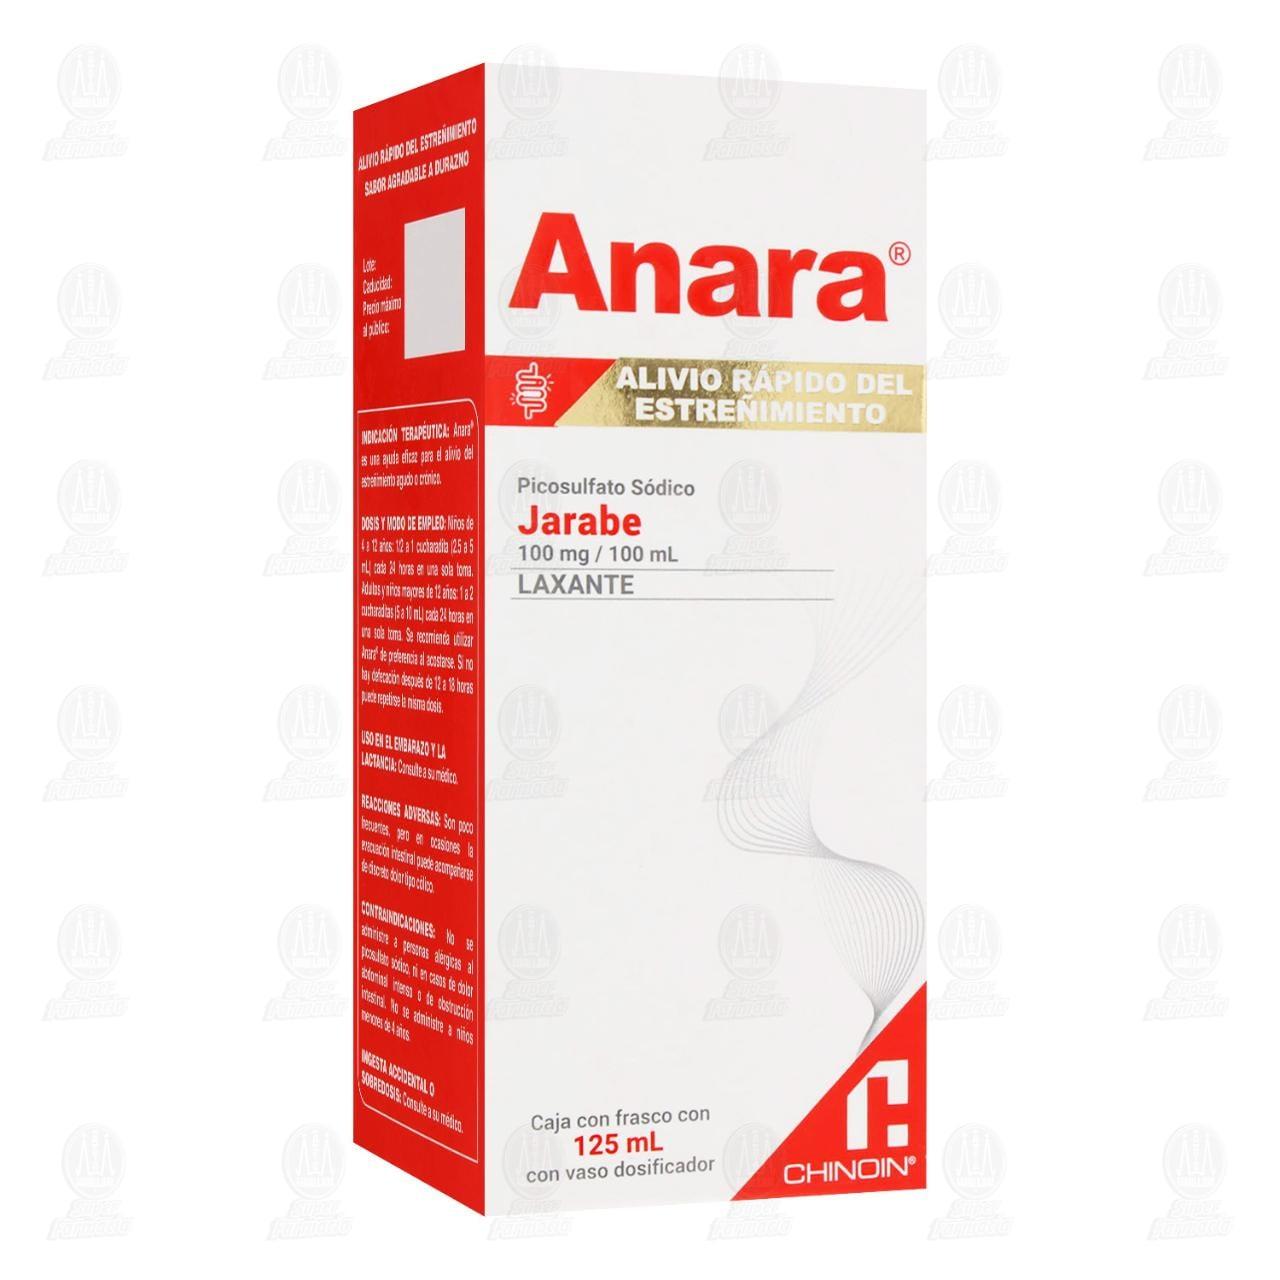 Comprar Anara 100mg/100ml 125ml Jarabe en Farmacias Guadalajara